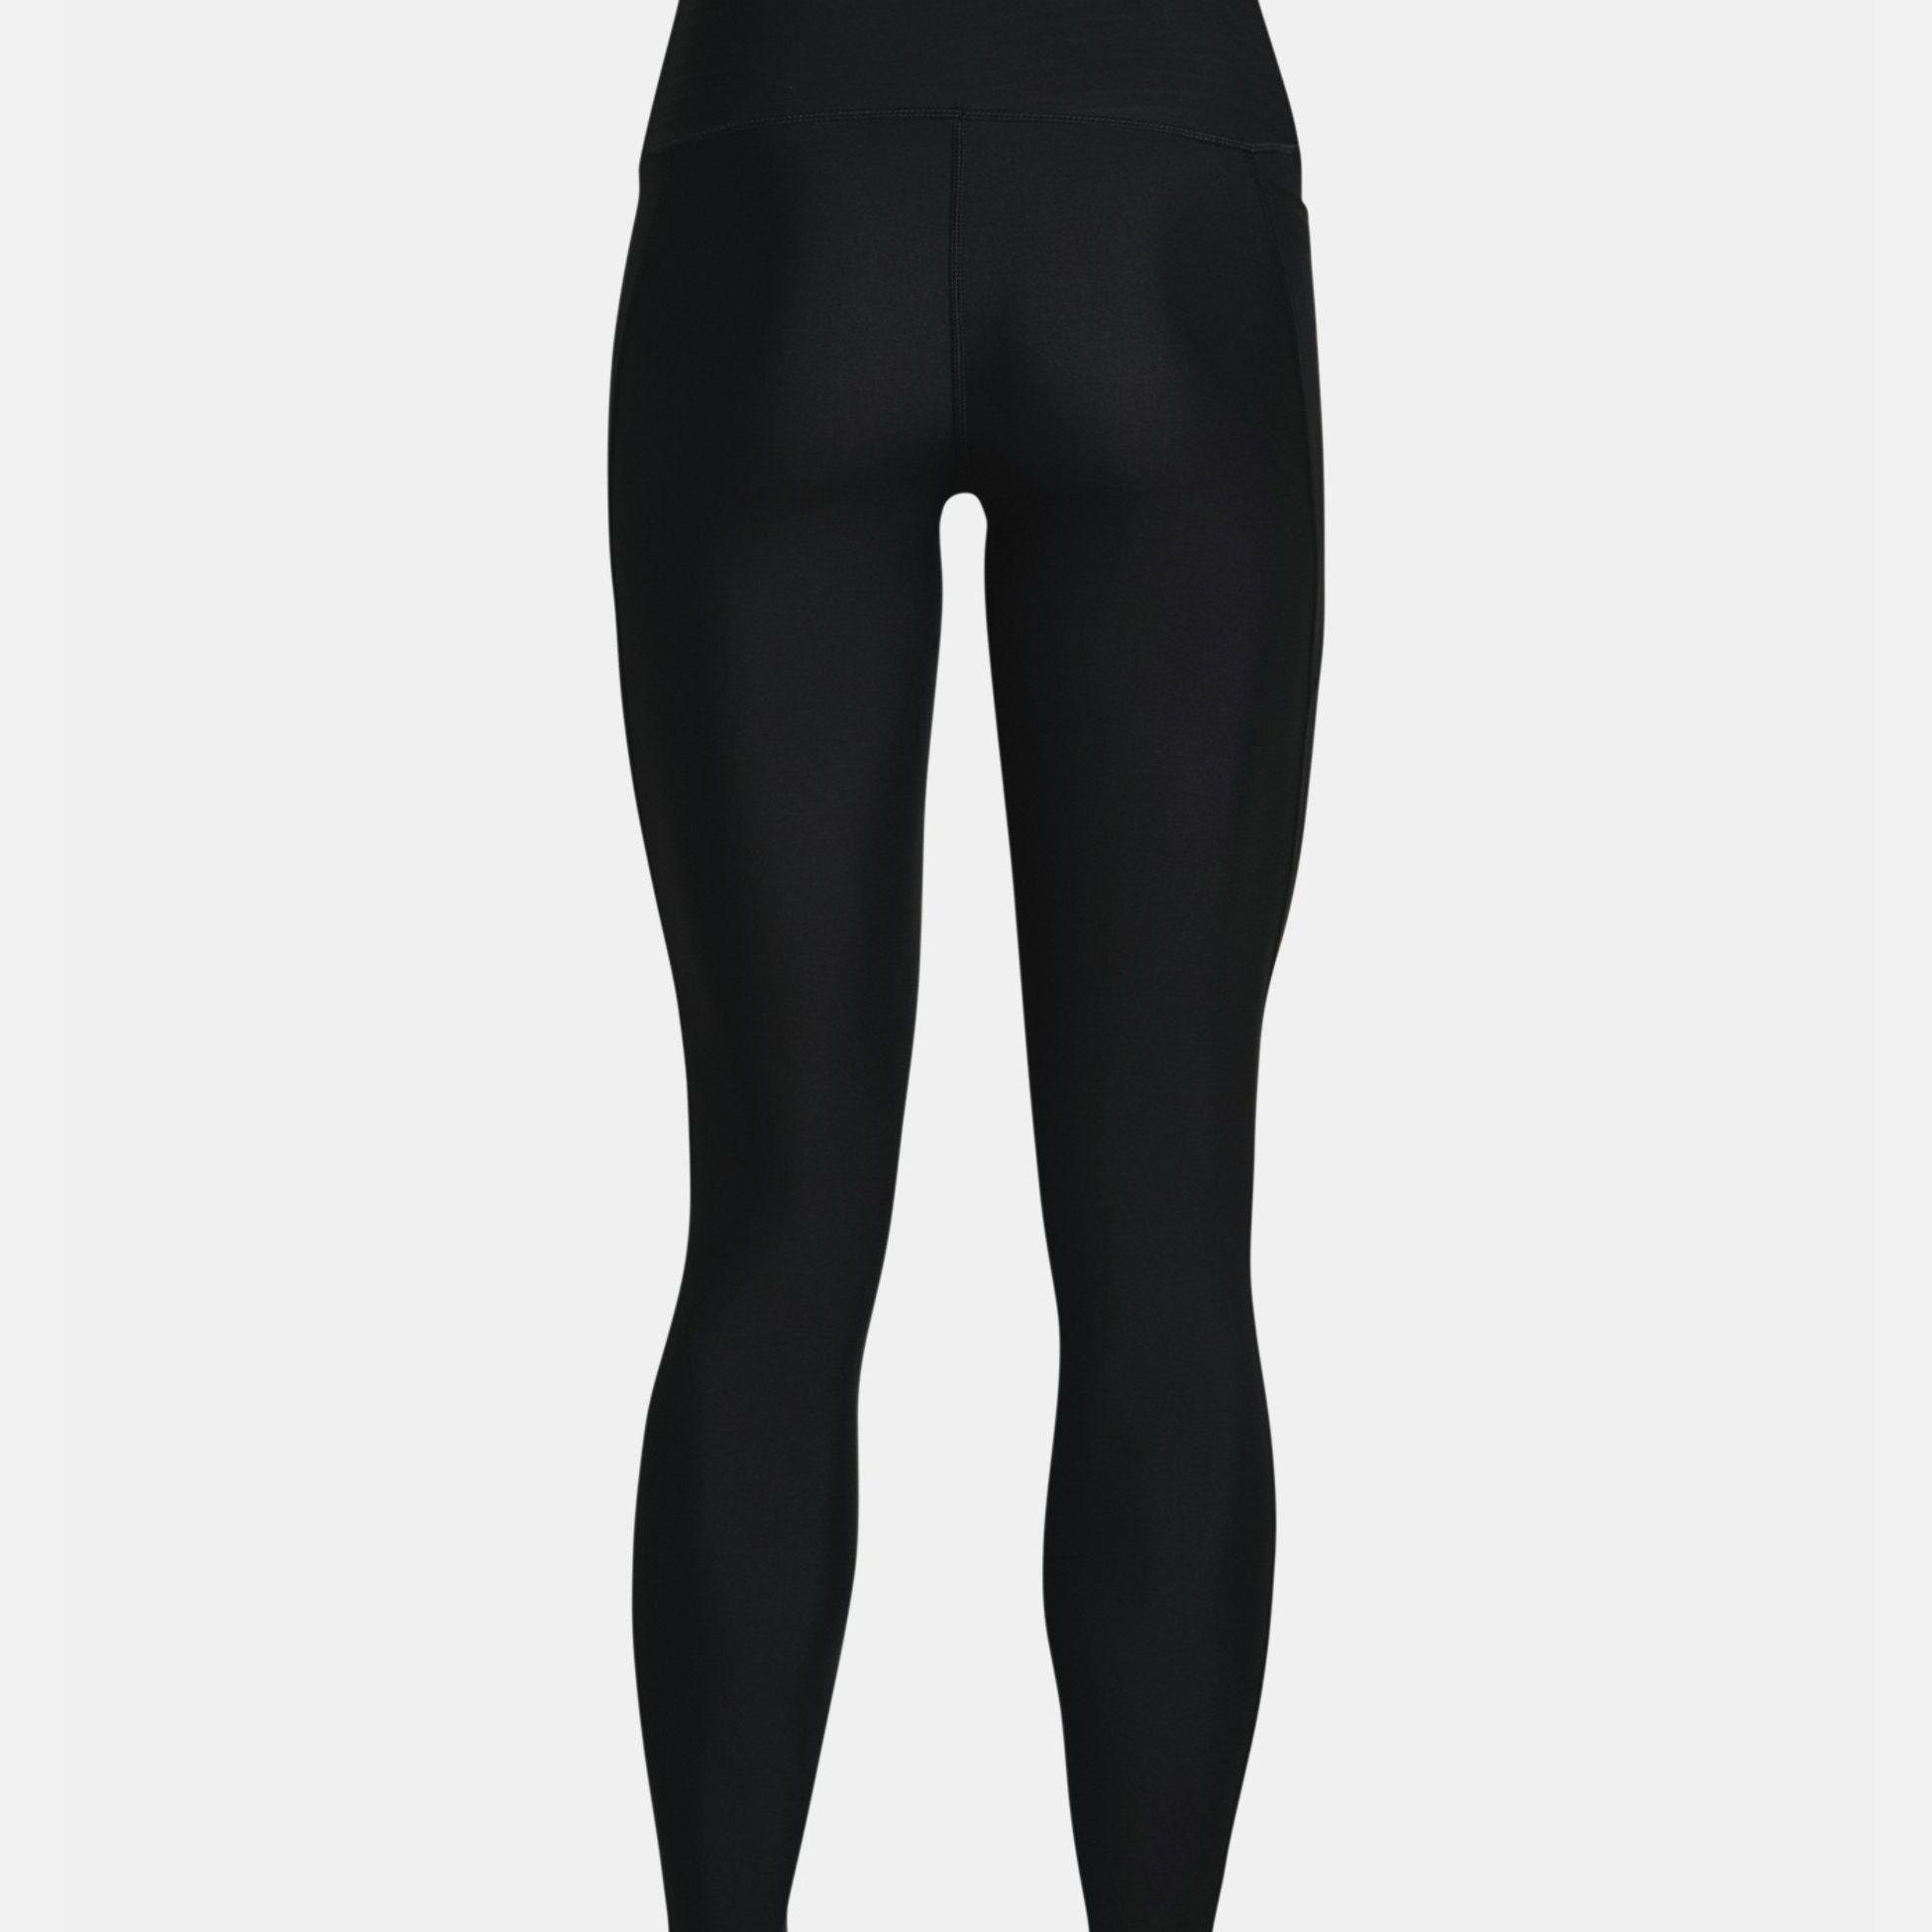 Îmbrăcăminte -  under armour HG Armour No-Slip Waistband Full-Length Leggings 5336